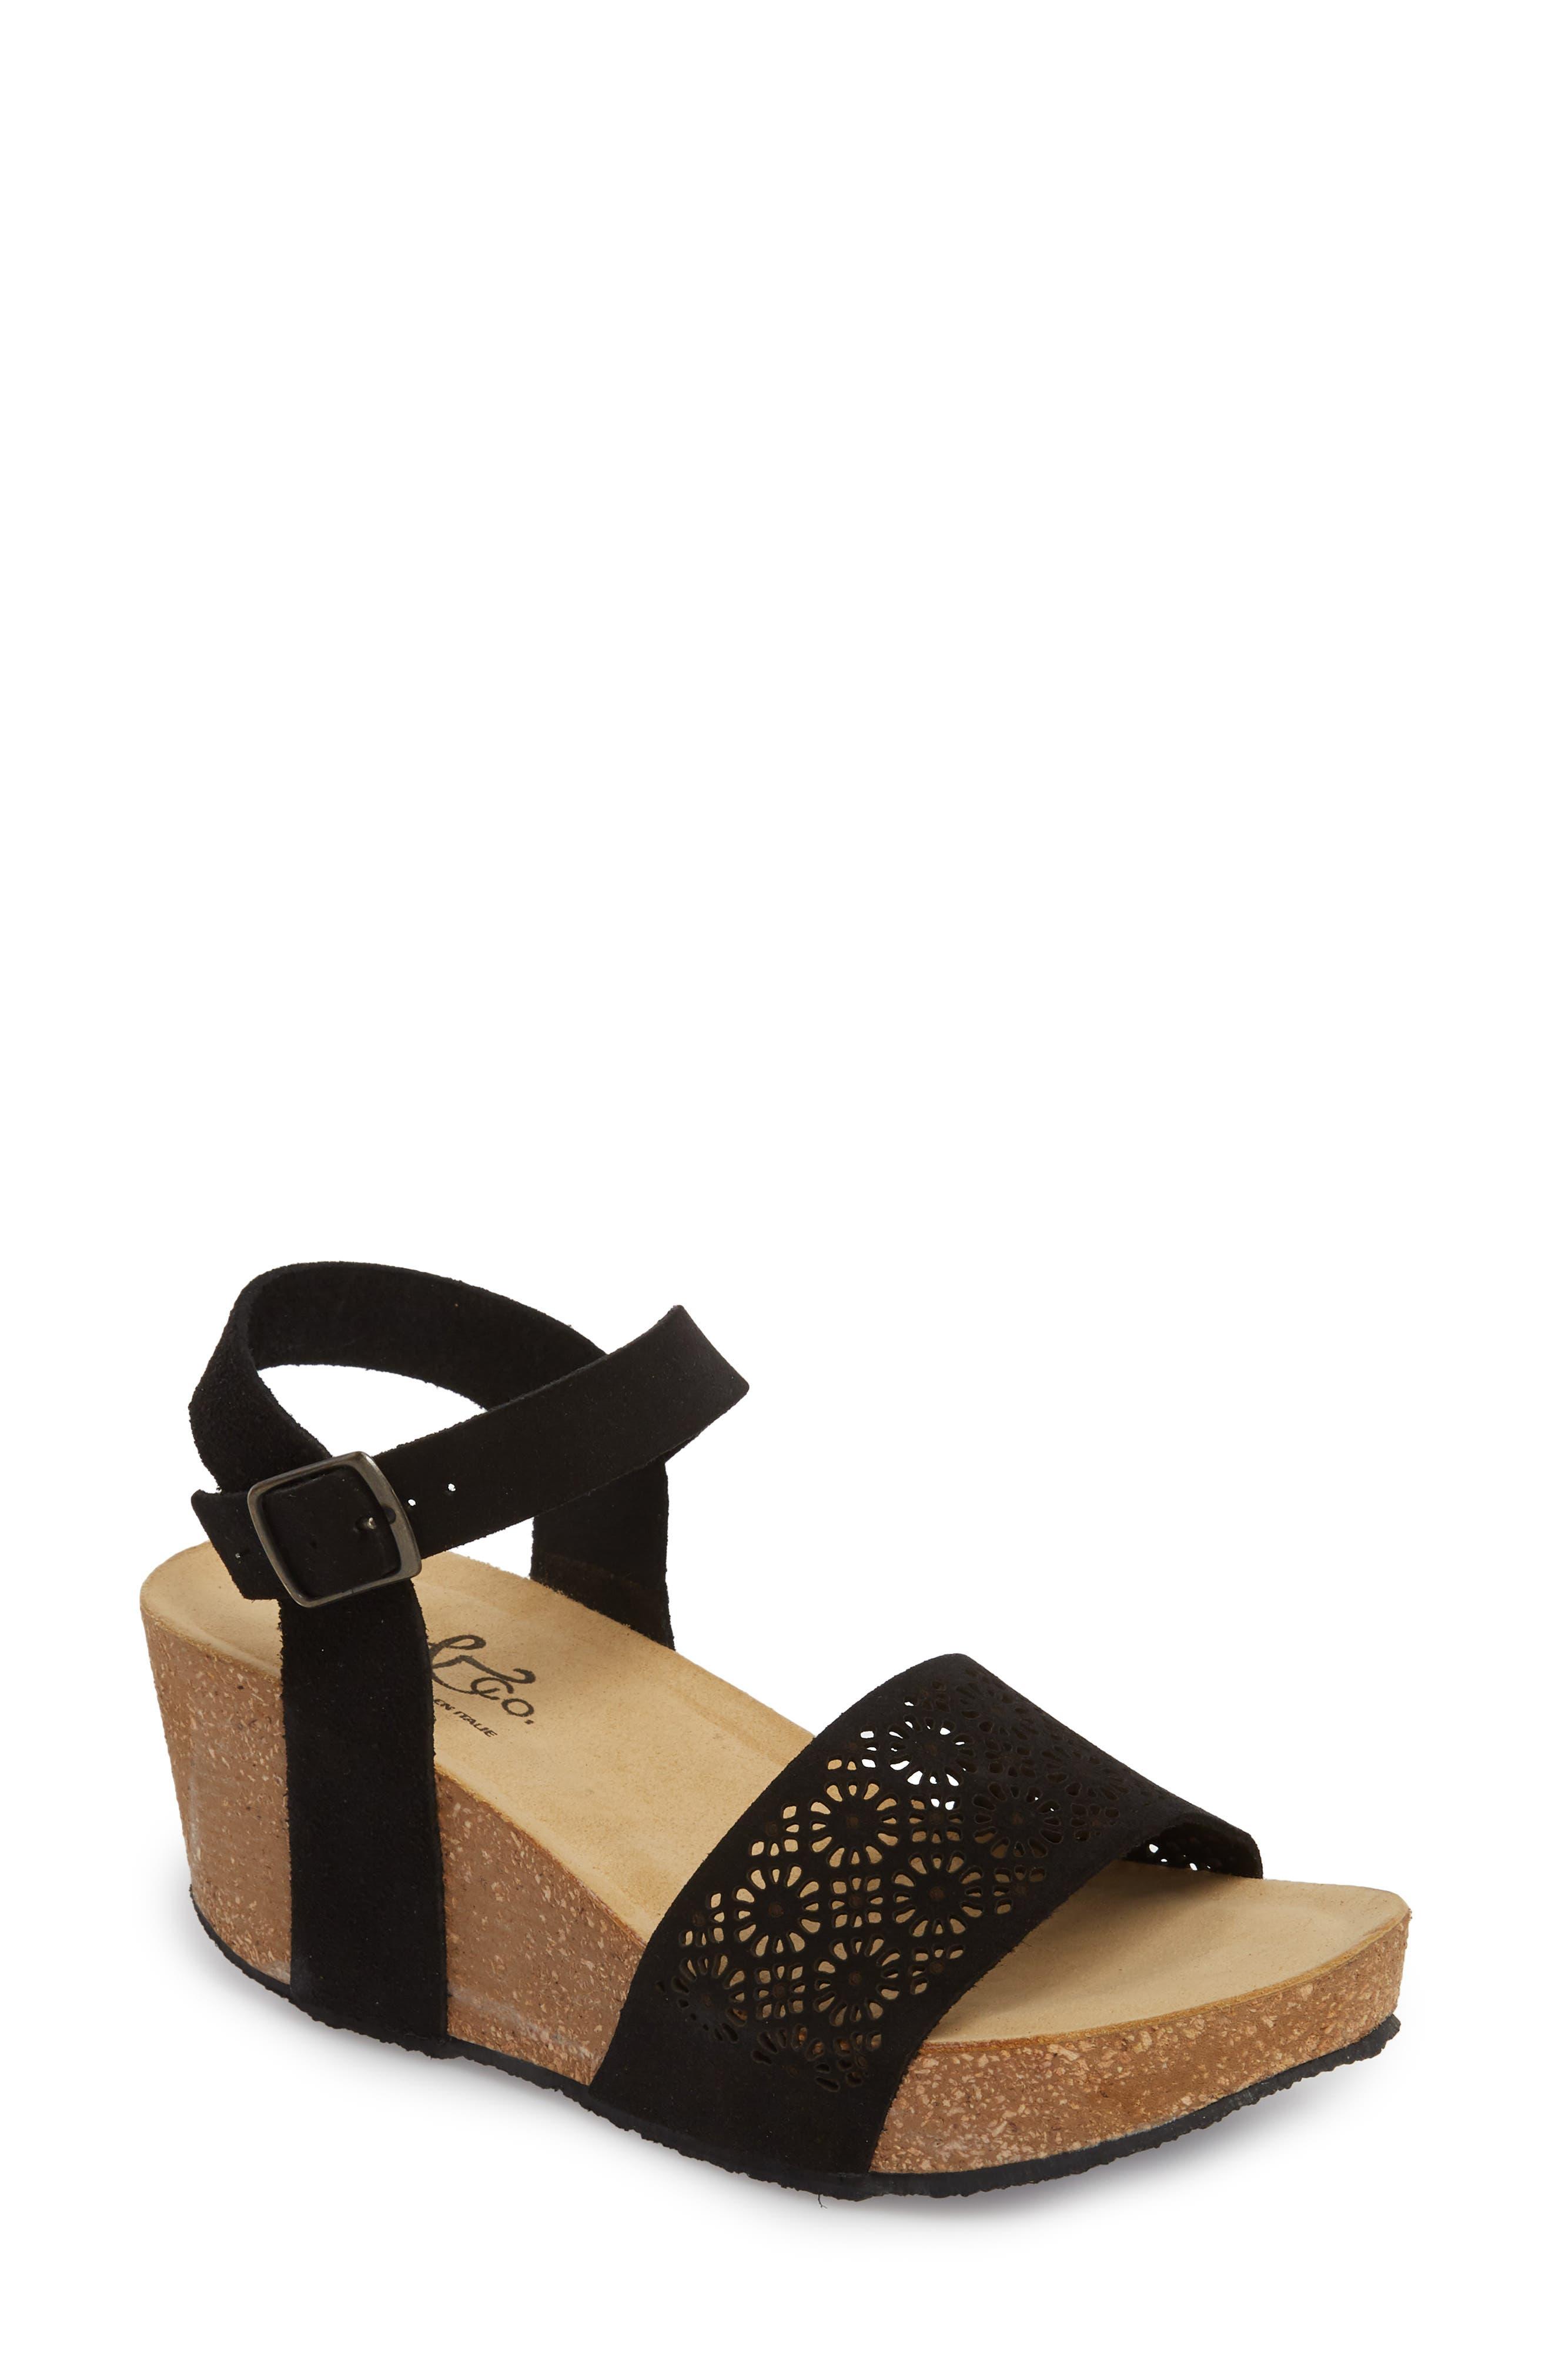 Bos. & Co. Lolo Platform Wedge Sandal, Black